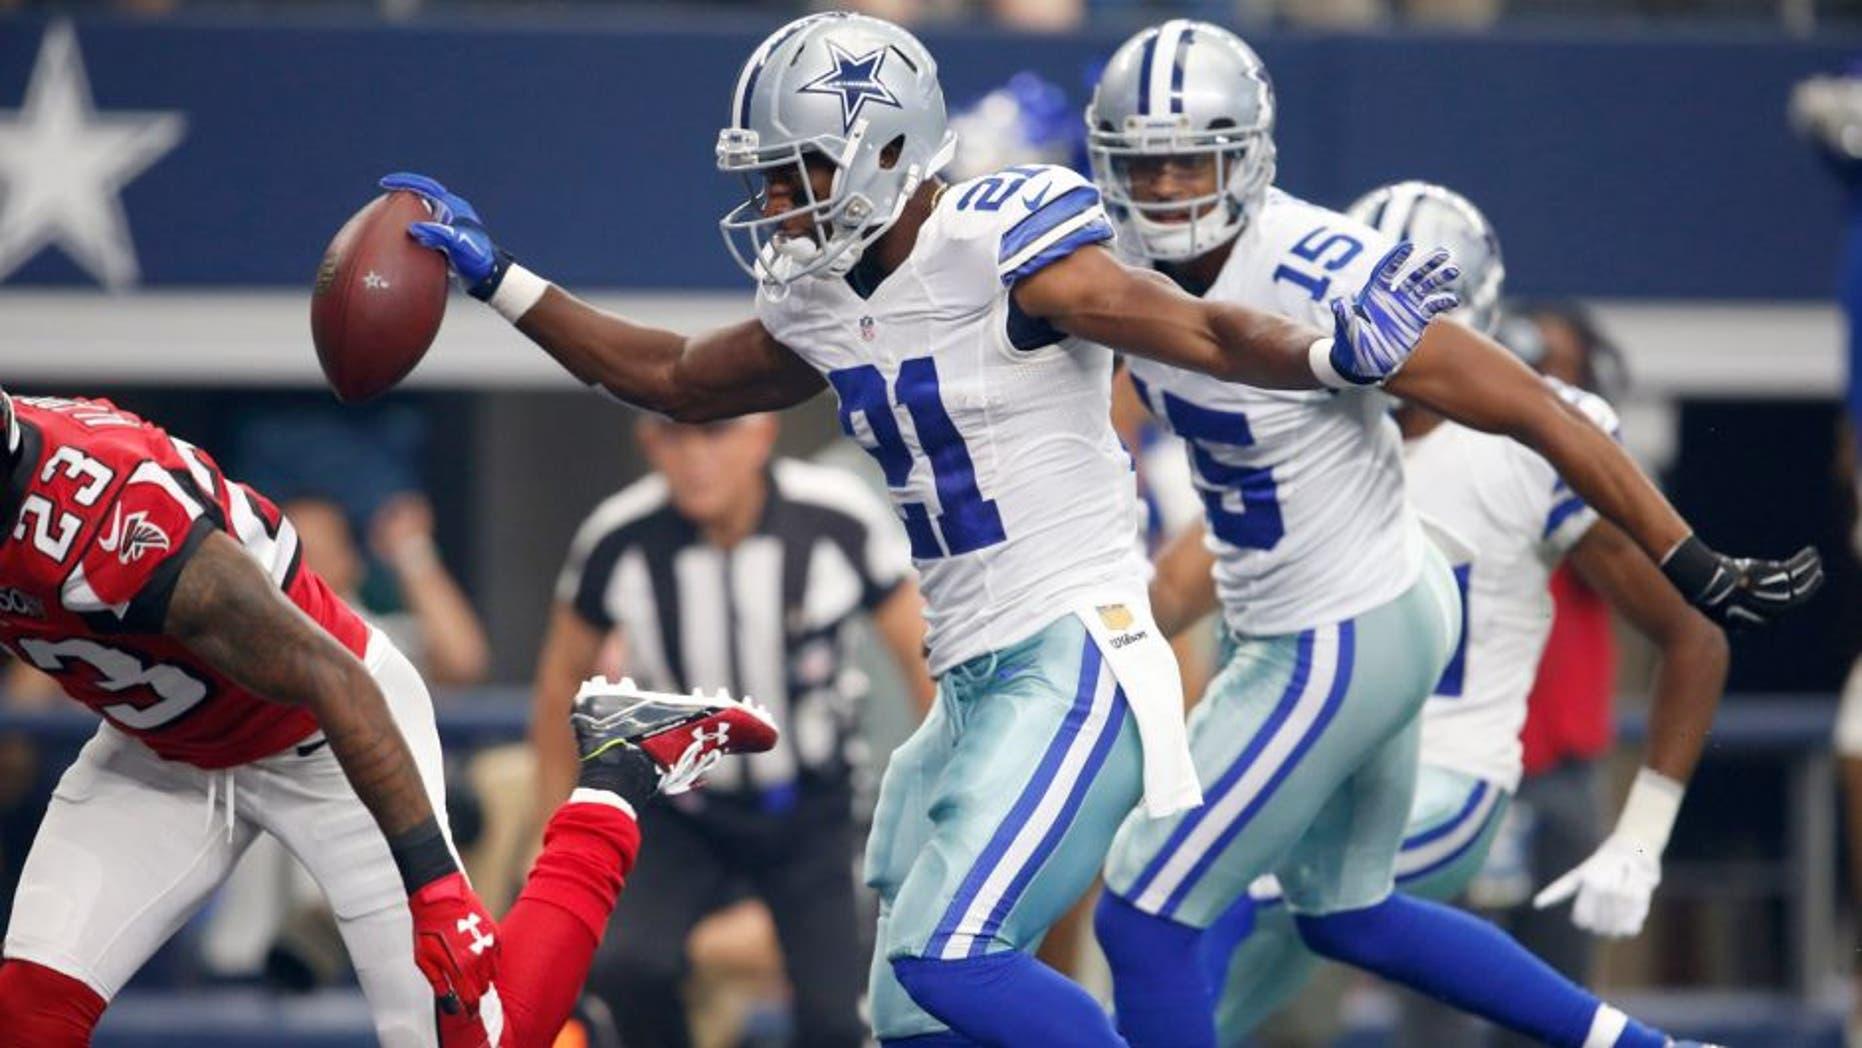 Sep 27, 2015; Arlington, TX, USA; Dallas Cowboys running back Joseph Randle (21) scores a first quarter touchdown against the Atlanta Falcons at AT&T Stadium. Mandatory Credit: Matthew Emmons-USA TODAY Sports